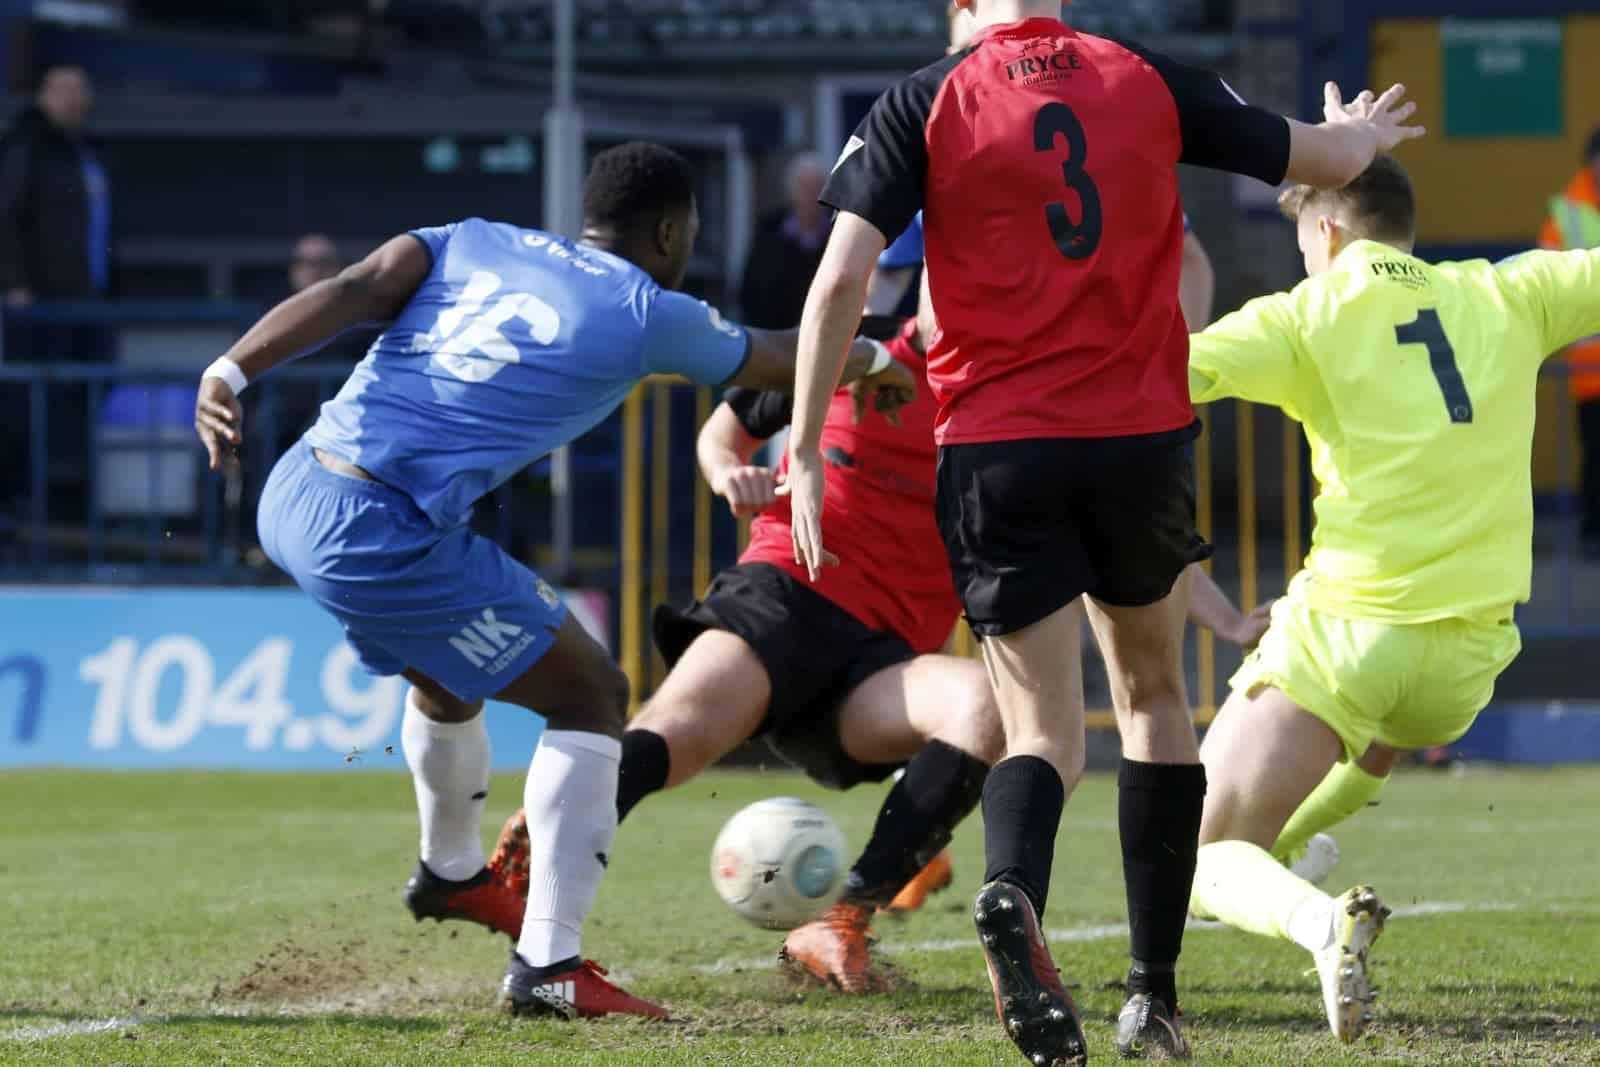 Darren Stephenson, Stockport County 1-0 Telford, 14.4.18